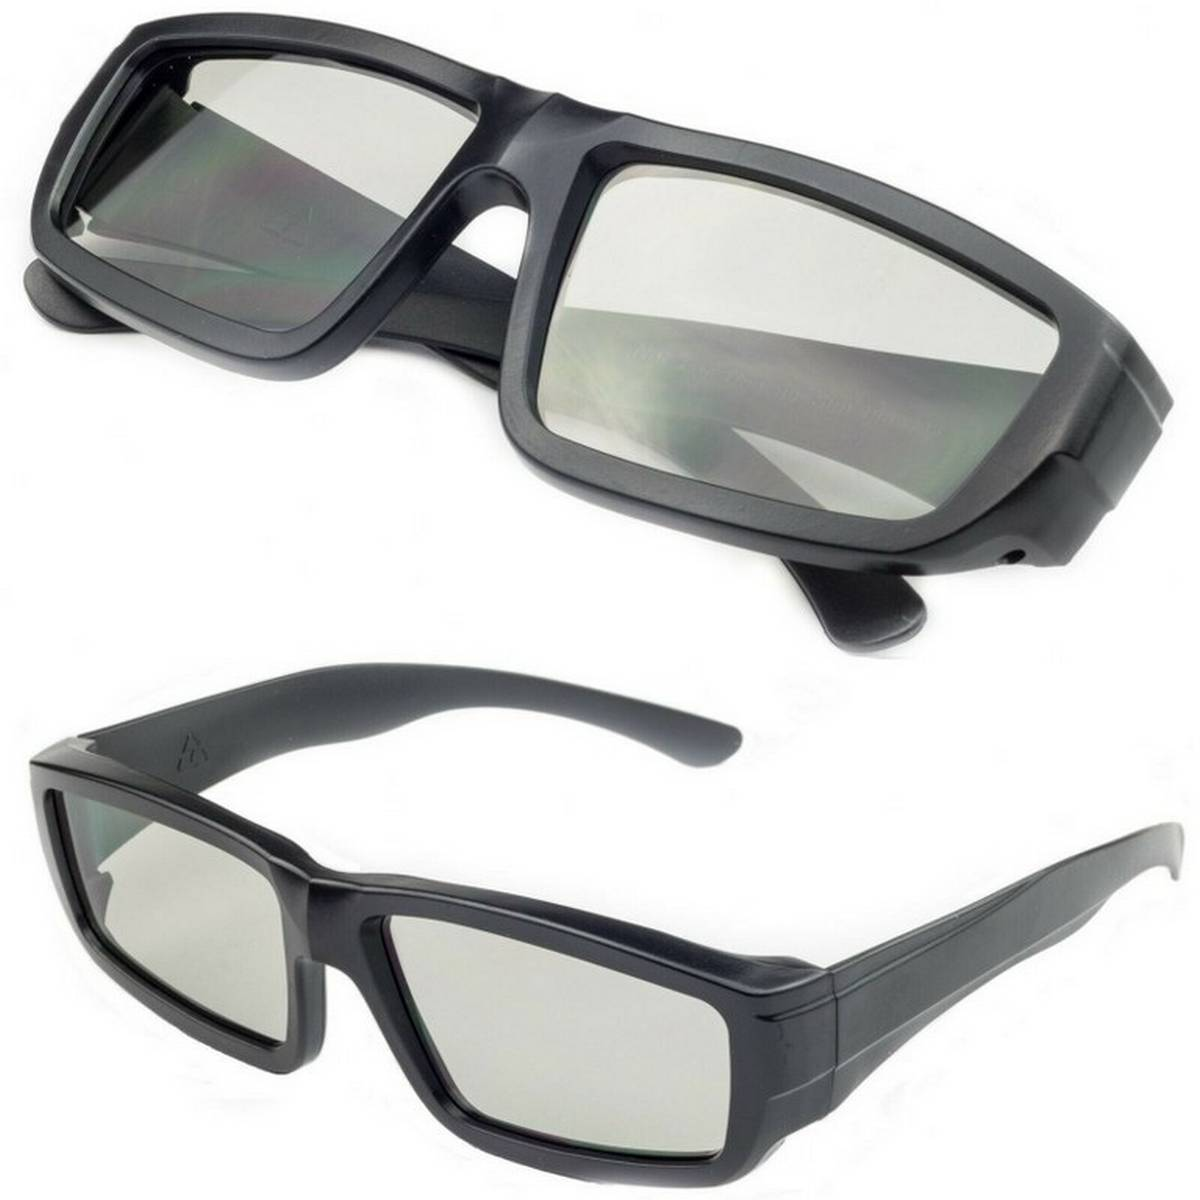 High Quality Clip On 3D Polarized Passive 3D Stereo Glasses Cinema 3D Glasses Clip on Eyesight Glasses Polarized 3D Glasses Used For Cinemas Films & 3D Enabled LED TV